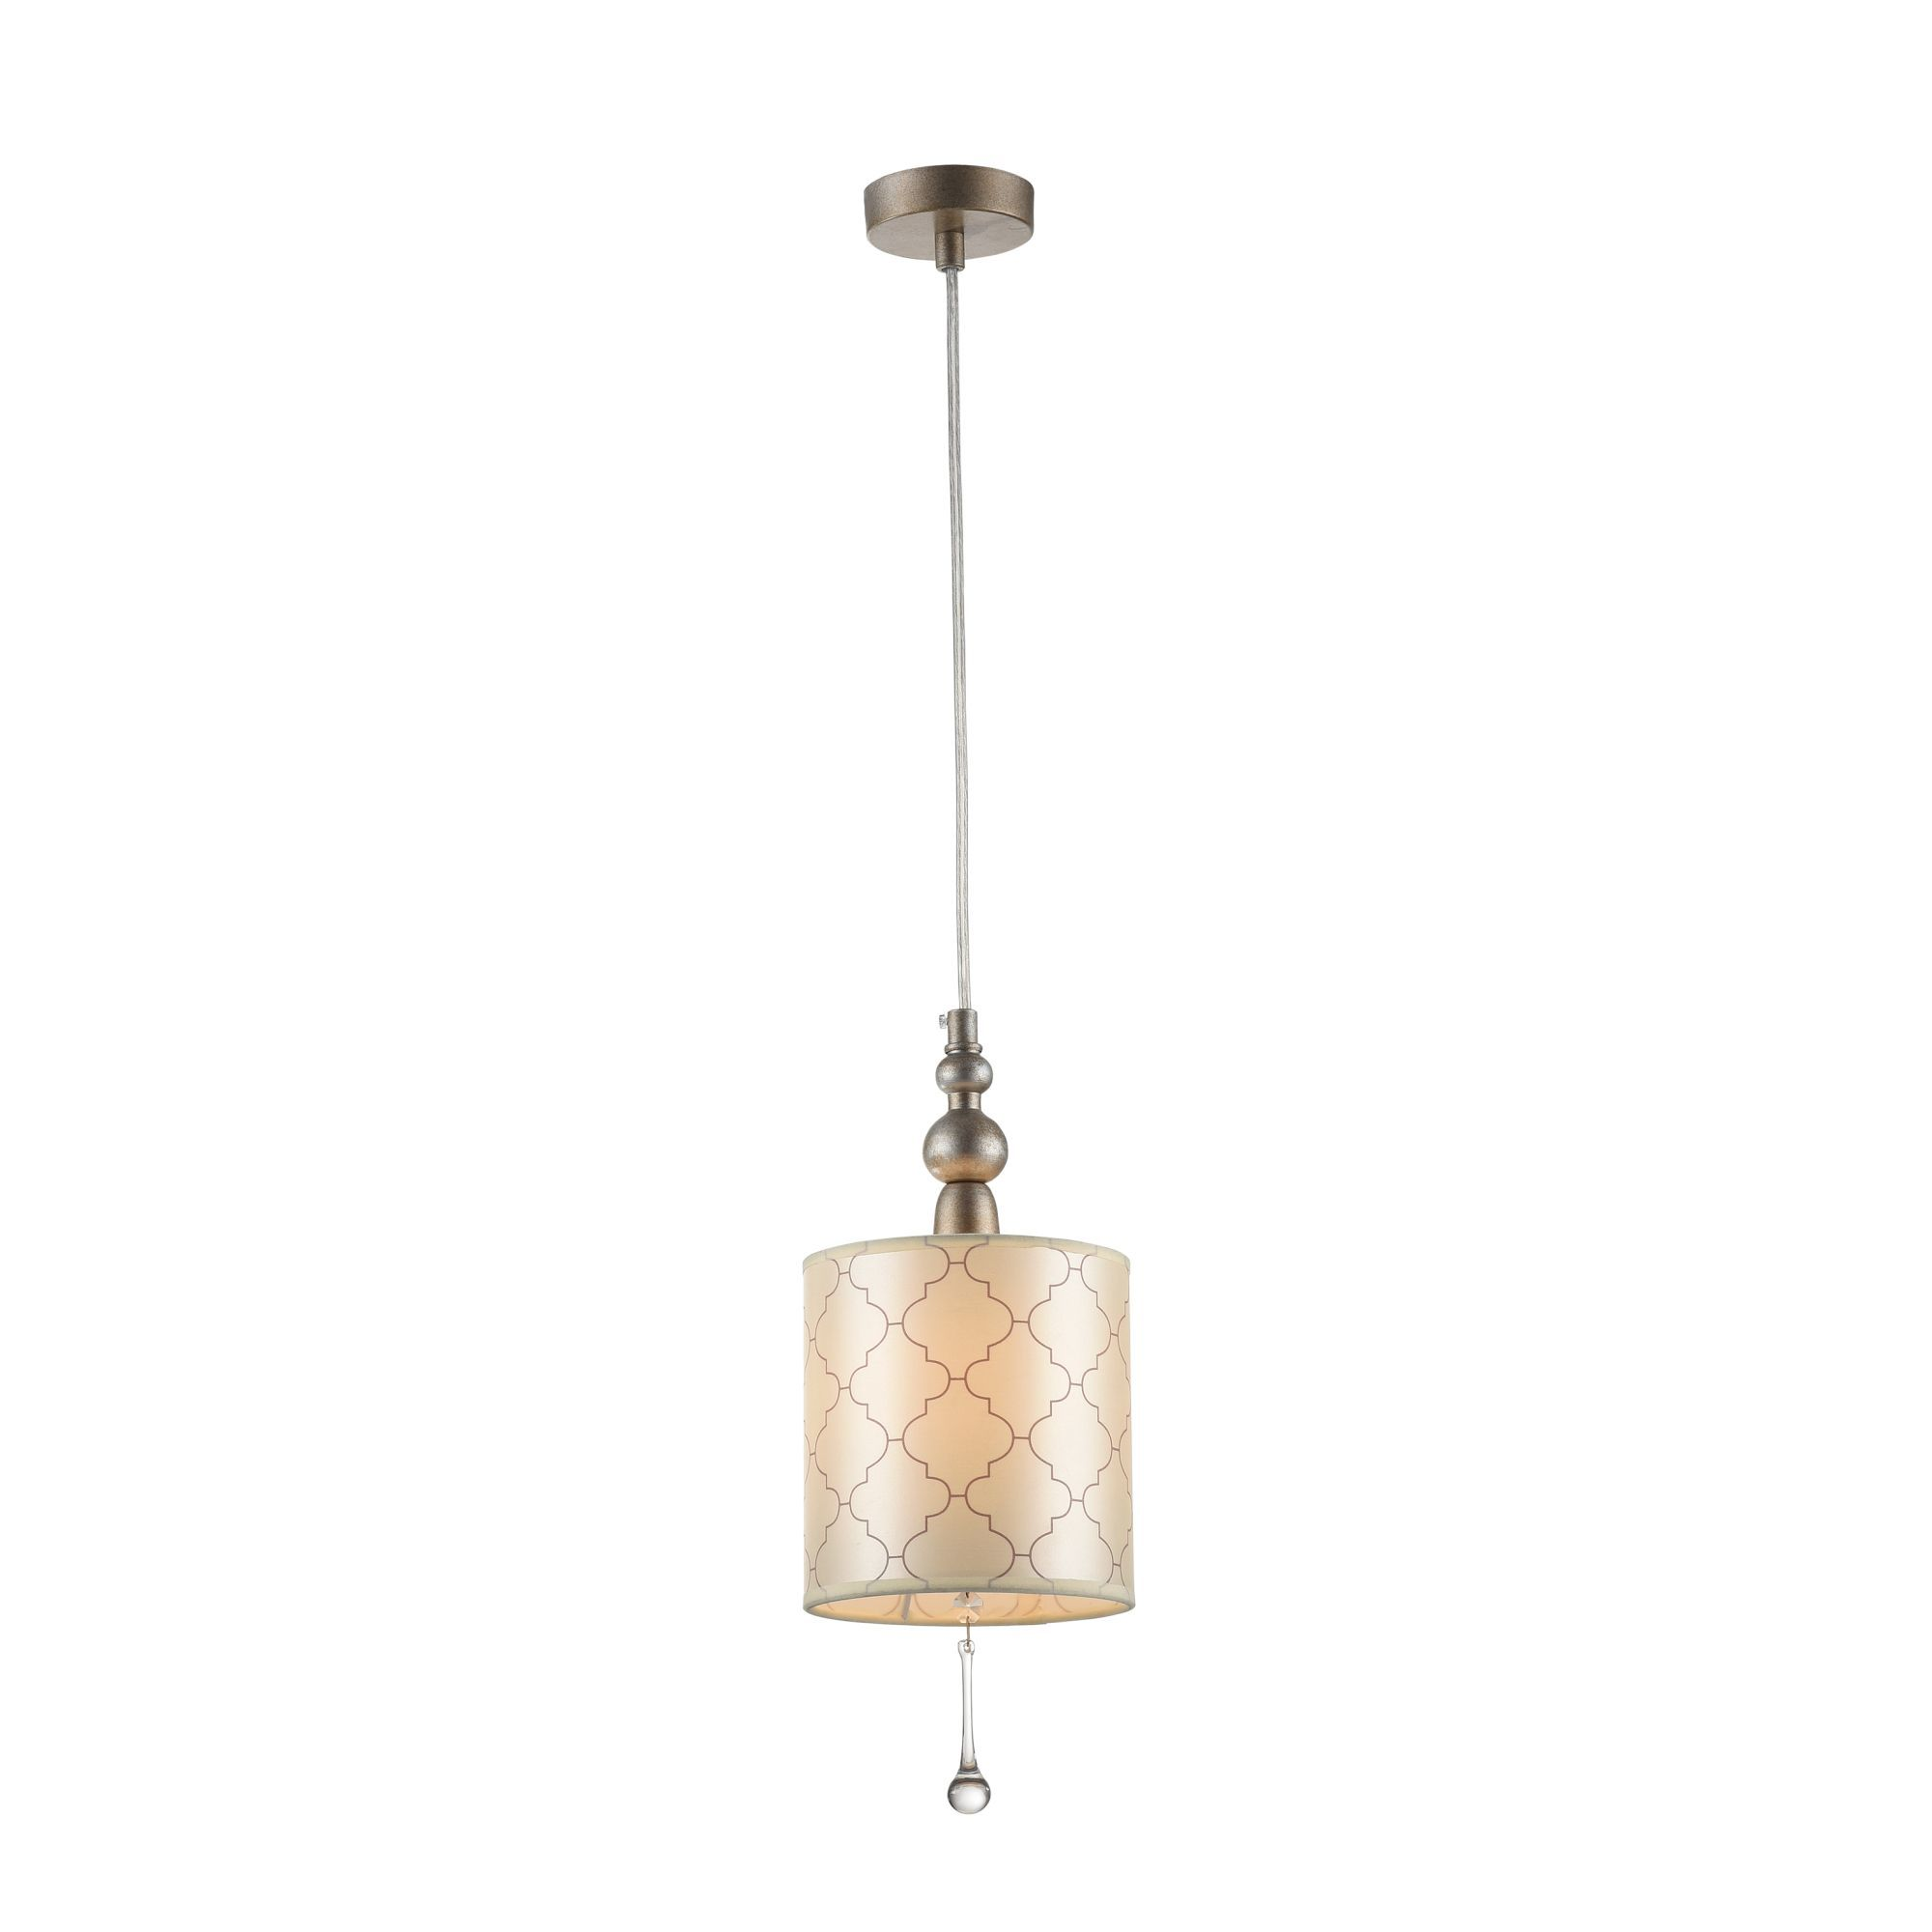 Подвесной светильник Maytoni Bience H018-PL-01-NG (dia018-22-ng), 1xE14x40W, серебро, бежевый, прозрачный, металл, текстиль, хрусталь - фото 1